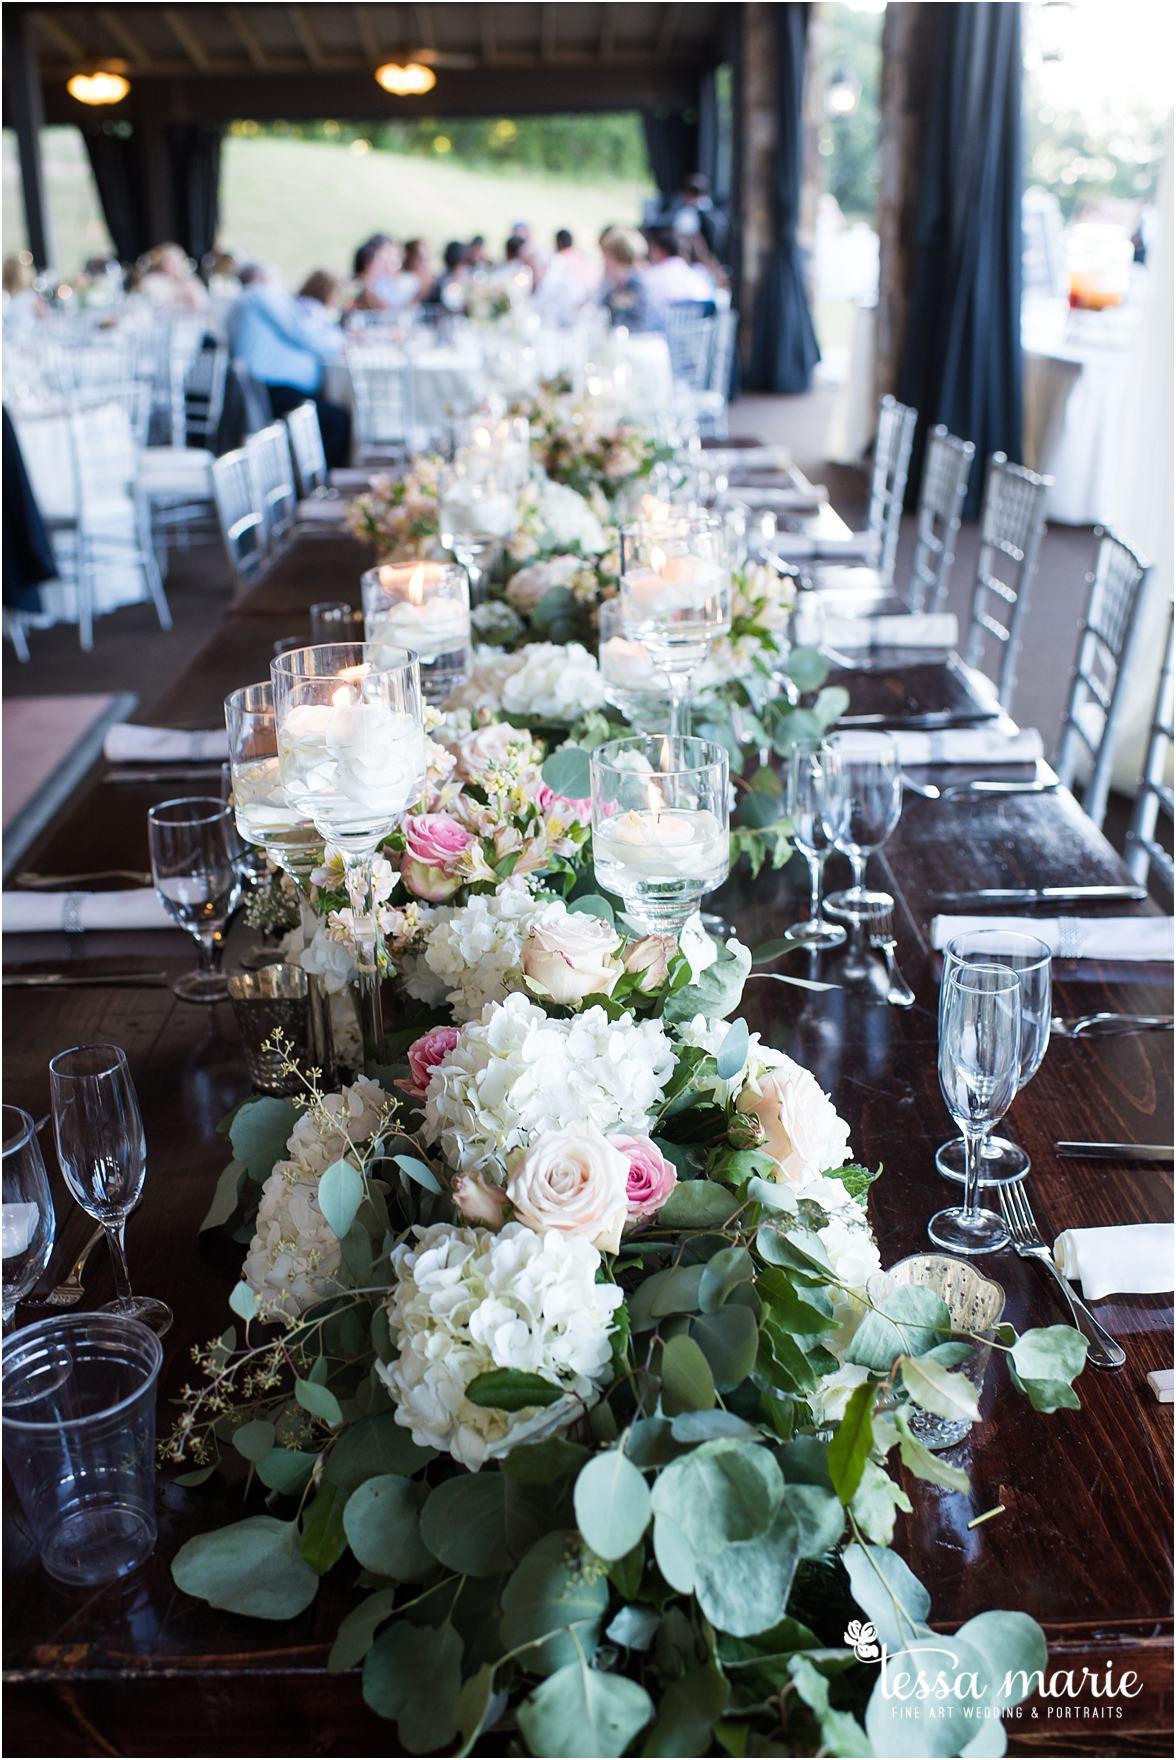 lake_lanier_wedding_summer_pictures_legacy_moments_family_candid_atlantas_best_wedding_photographer_tessa_marie_weddings_lake_lanier_bride_out_door_wedding_0296